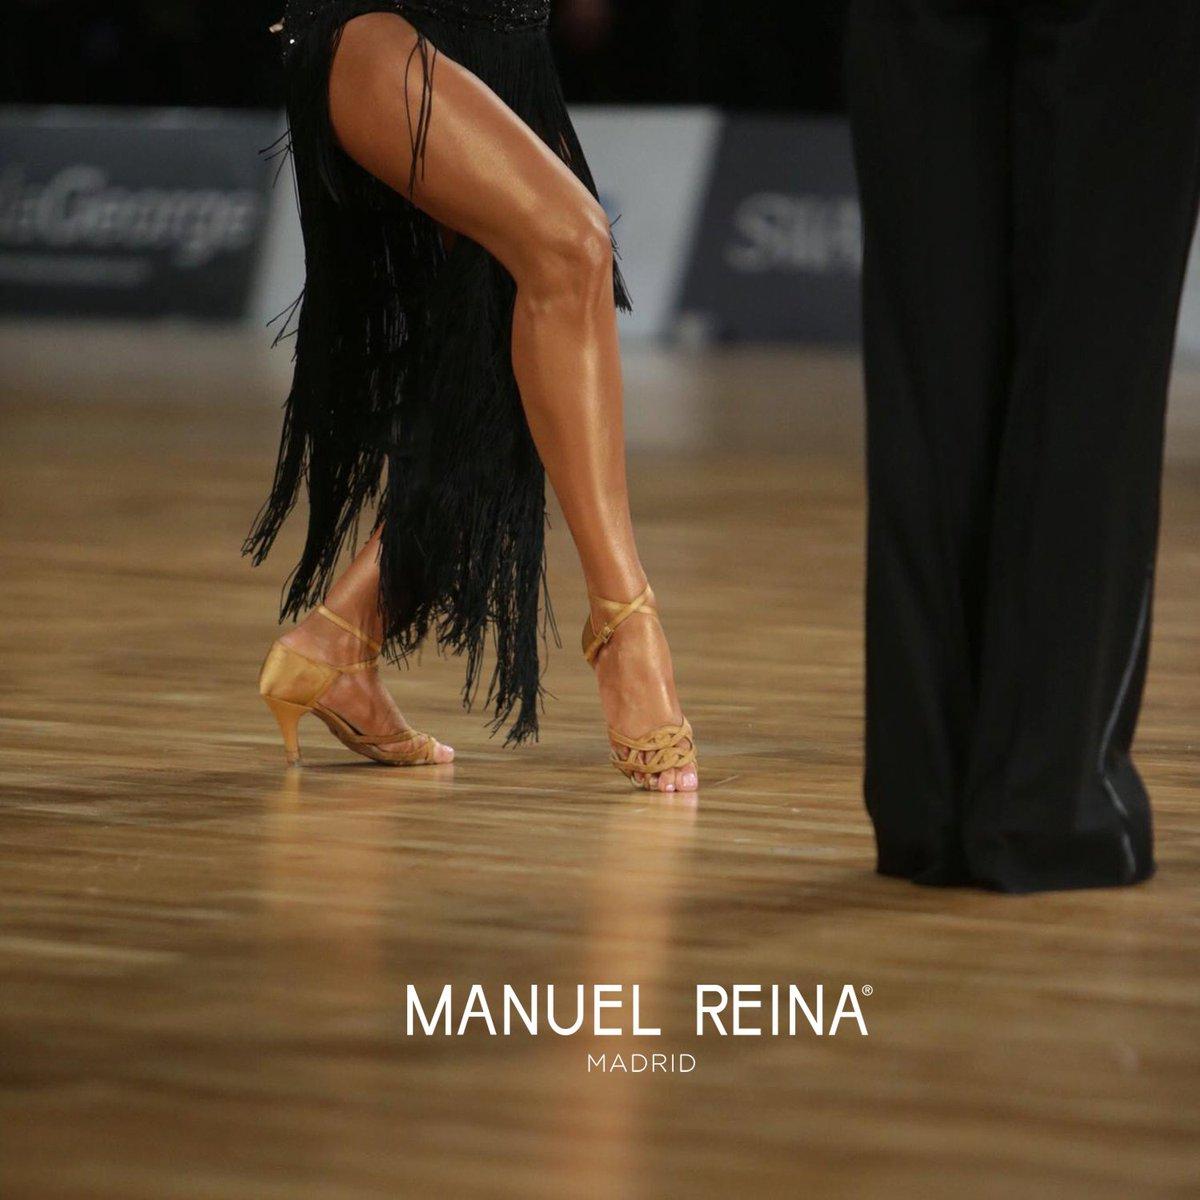 Nacidos en la alta competición  IV Campeones de España   Cristina Mañas Jimenez   • #manuelreina #mnlrnshs #dancers #dance #danceshoes #sandalias #dancesport #competition #bailar #bailarina #campeones #ChampionsLeaguepic.twitter.com/VIUt3KeEGQ